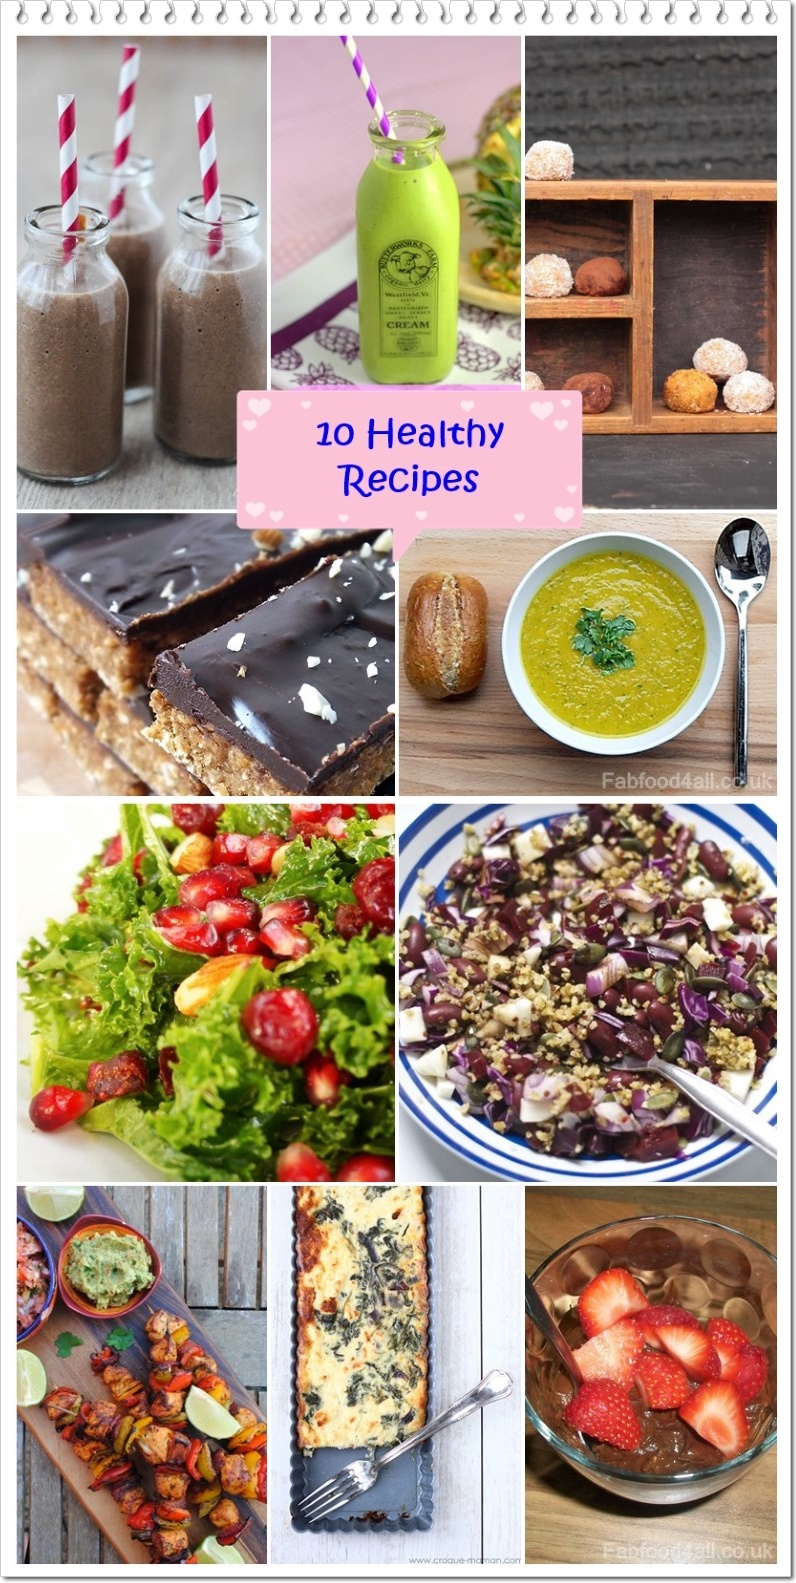 10 Healthy Recipes - @FabFood4All